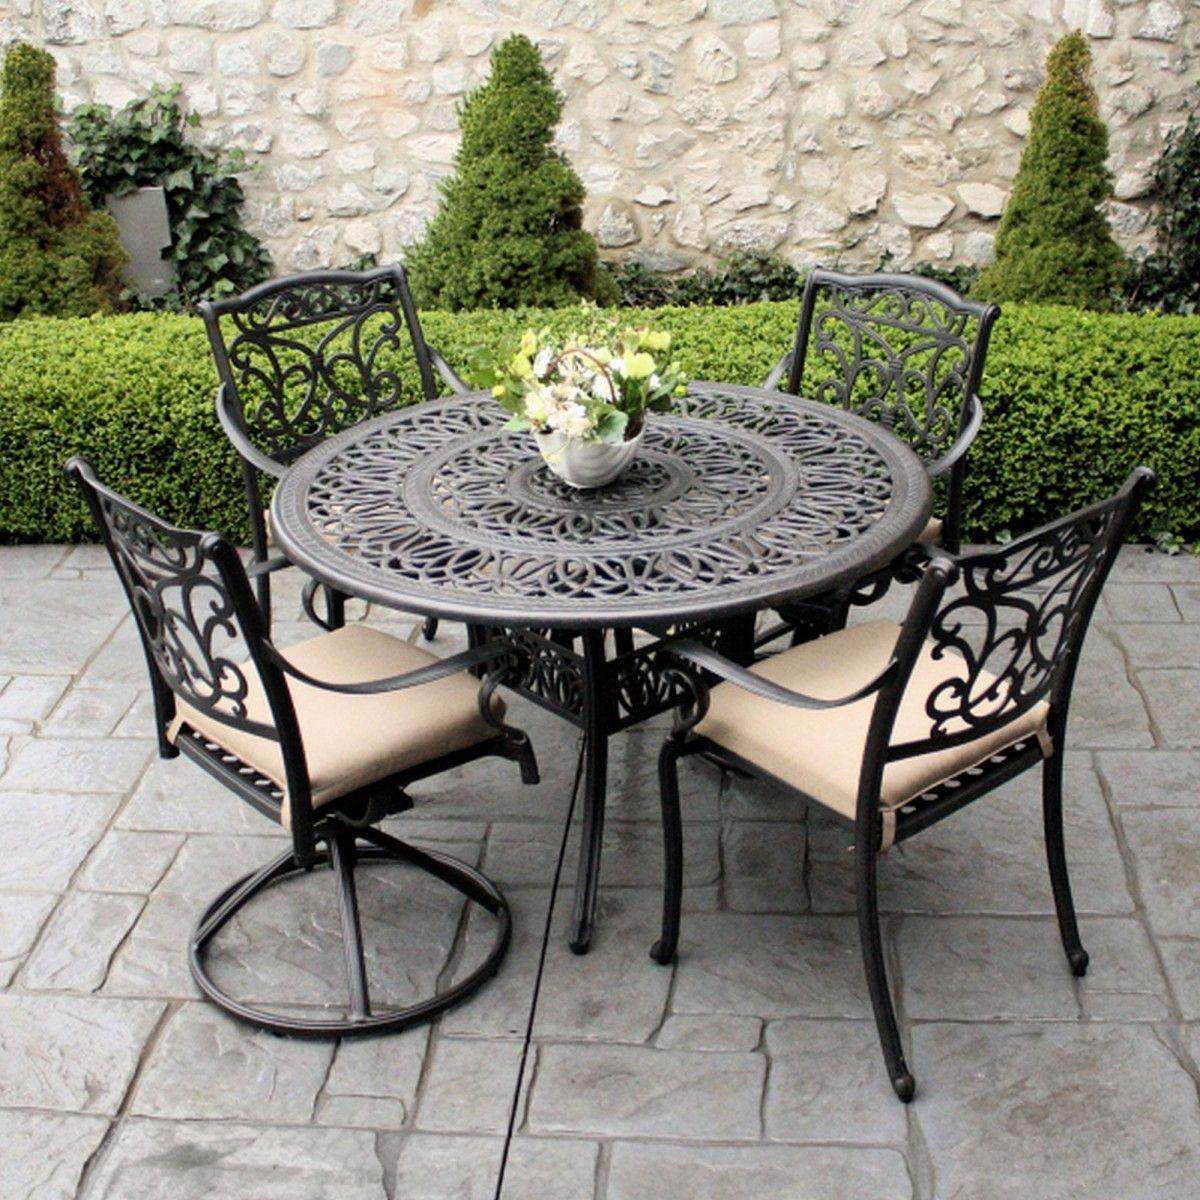 Wrought Iron Patio Furniture Pinterest